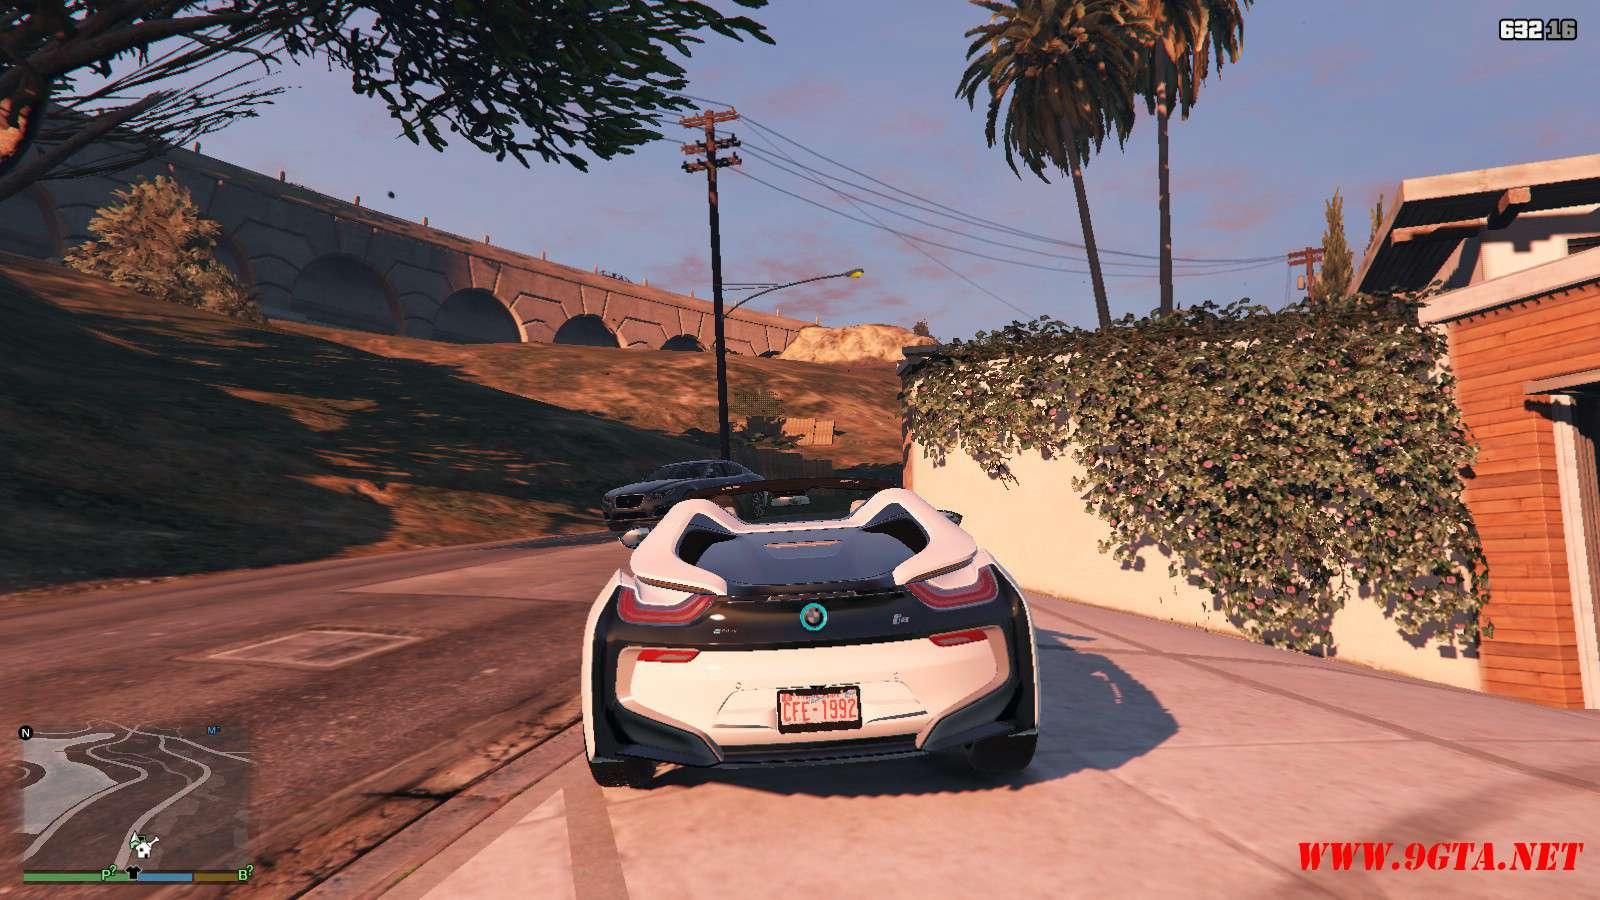 2019 BMW I8 Roadster GTA5 Mods (2)